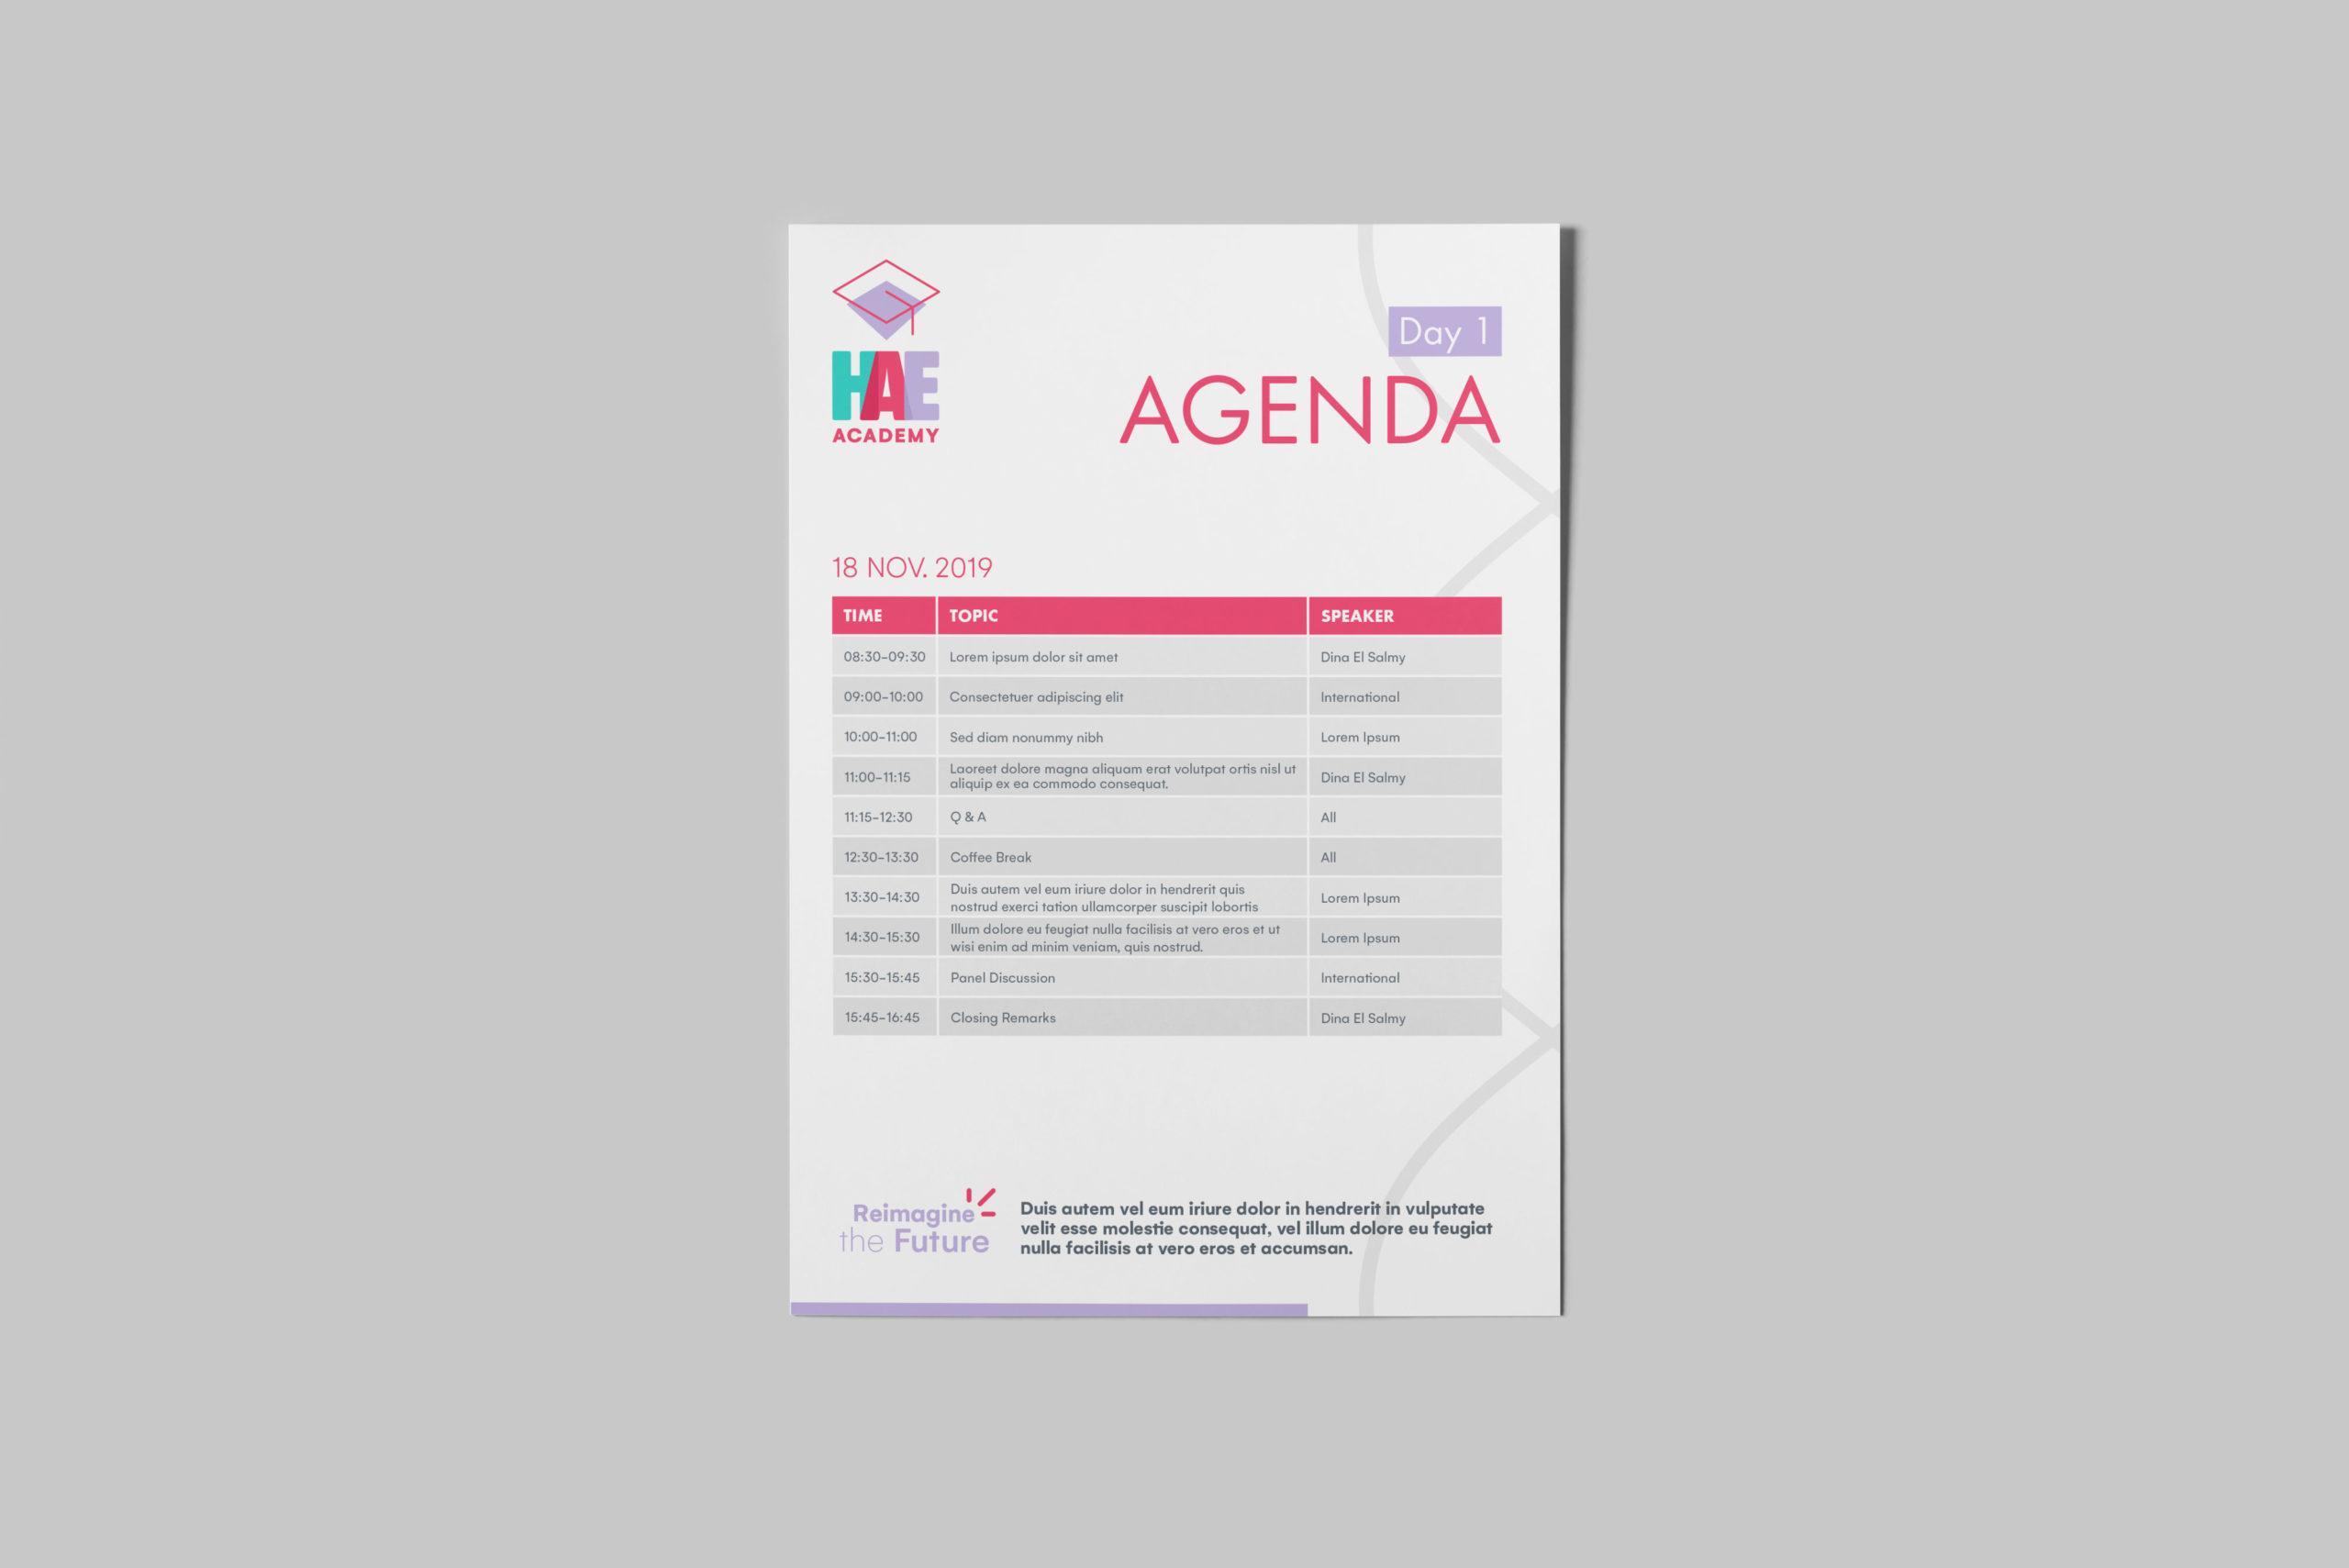 Takeda-Hae-04.agenda